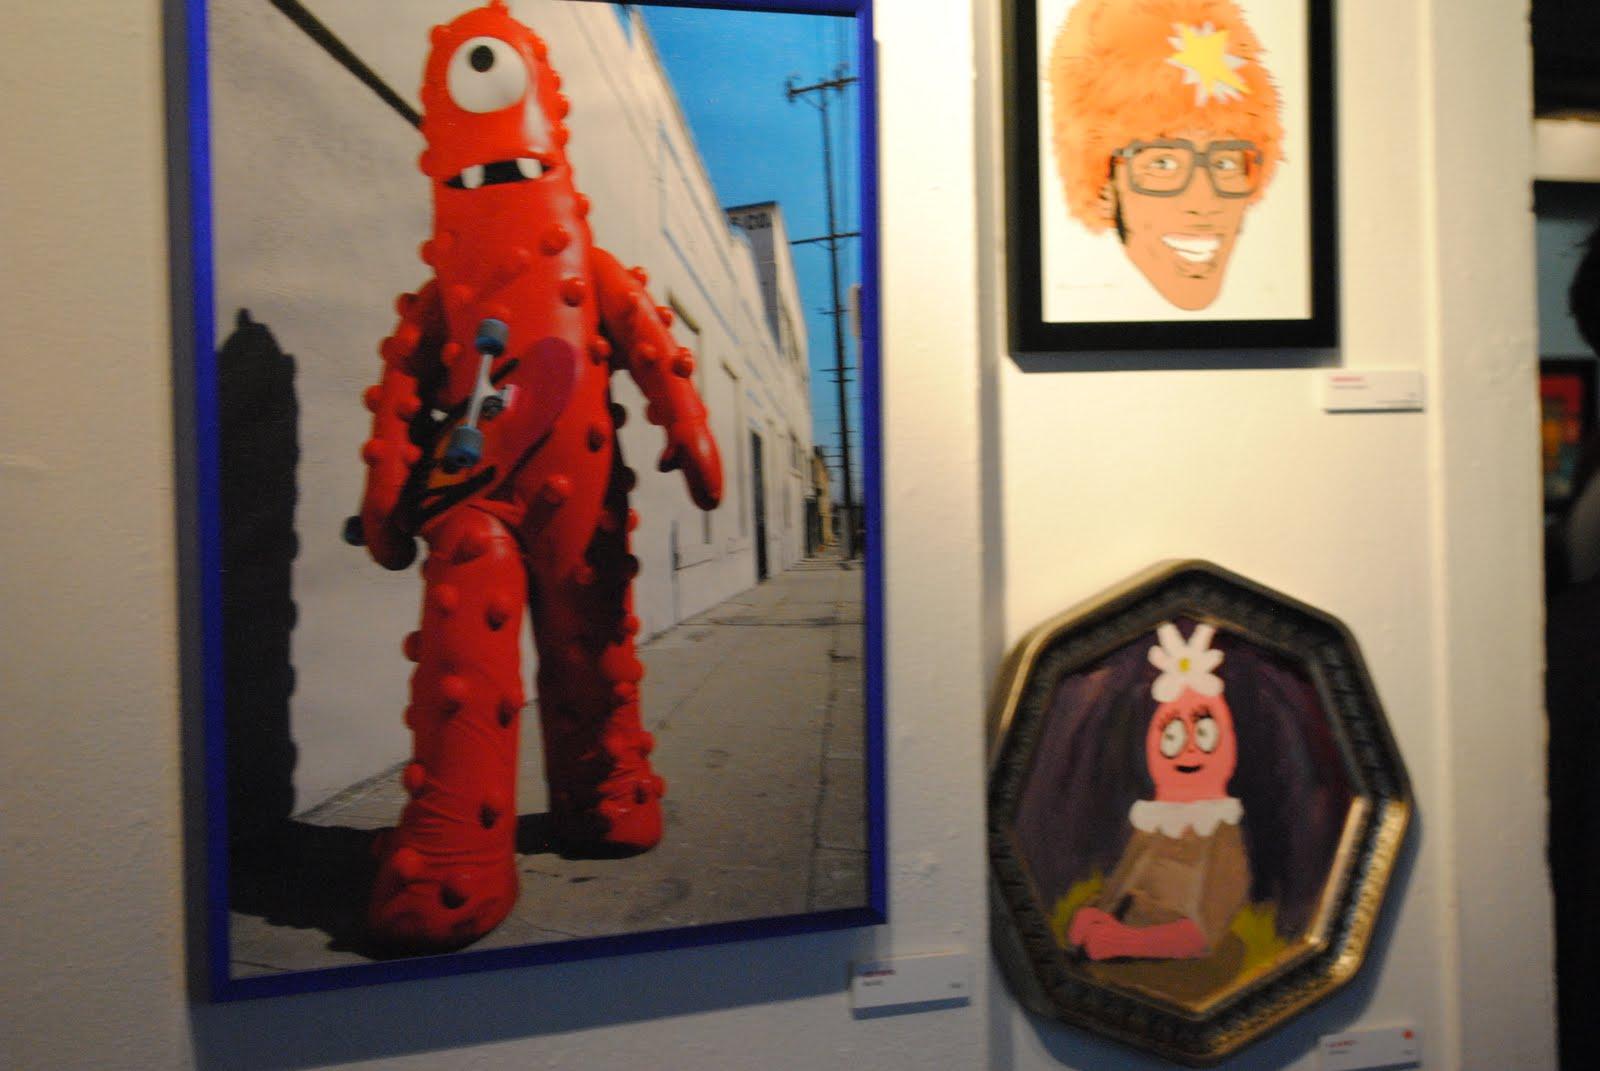 http://3.bp.blogspot.com/-Bt8eWs4IFdI/TfAdzUPXnAI/AAAAAAAAJnQ/CcCjTh8_Y2s/s1600/Yo+Gabba+Gabba+Art+Show+%252828%2529.JPG